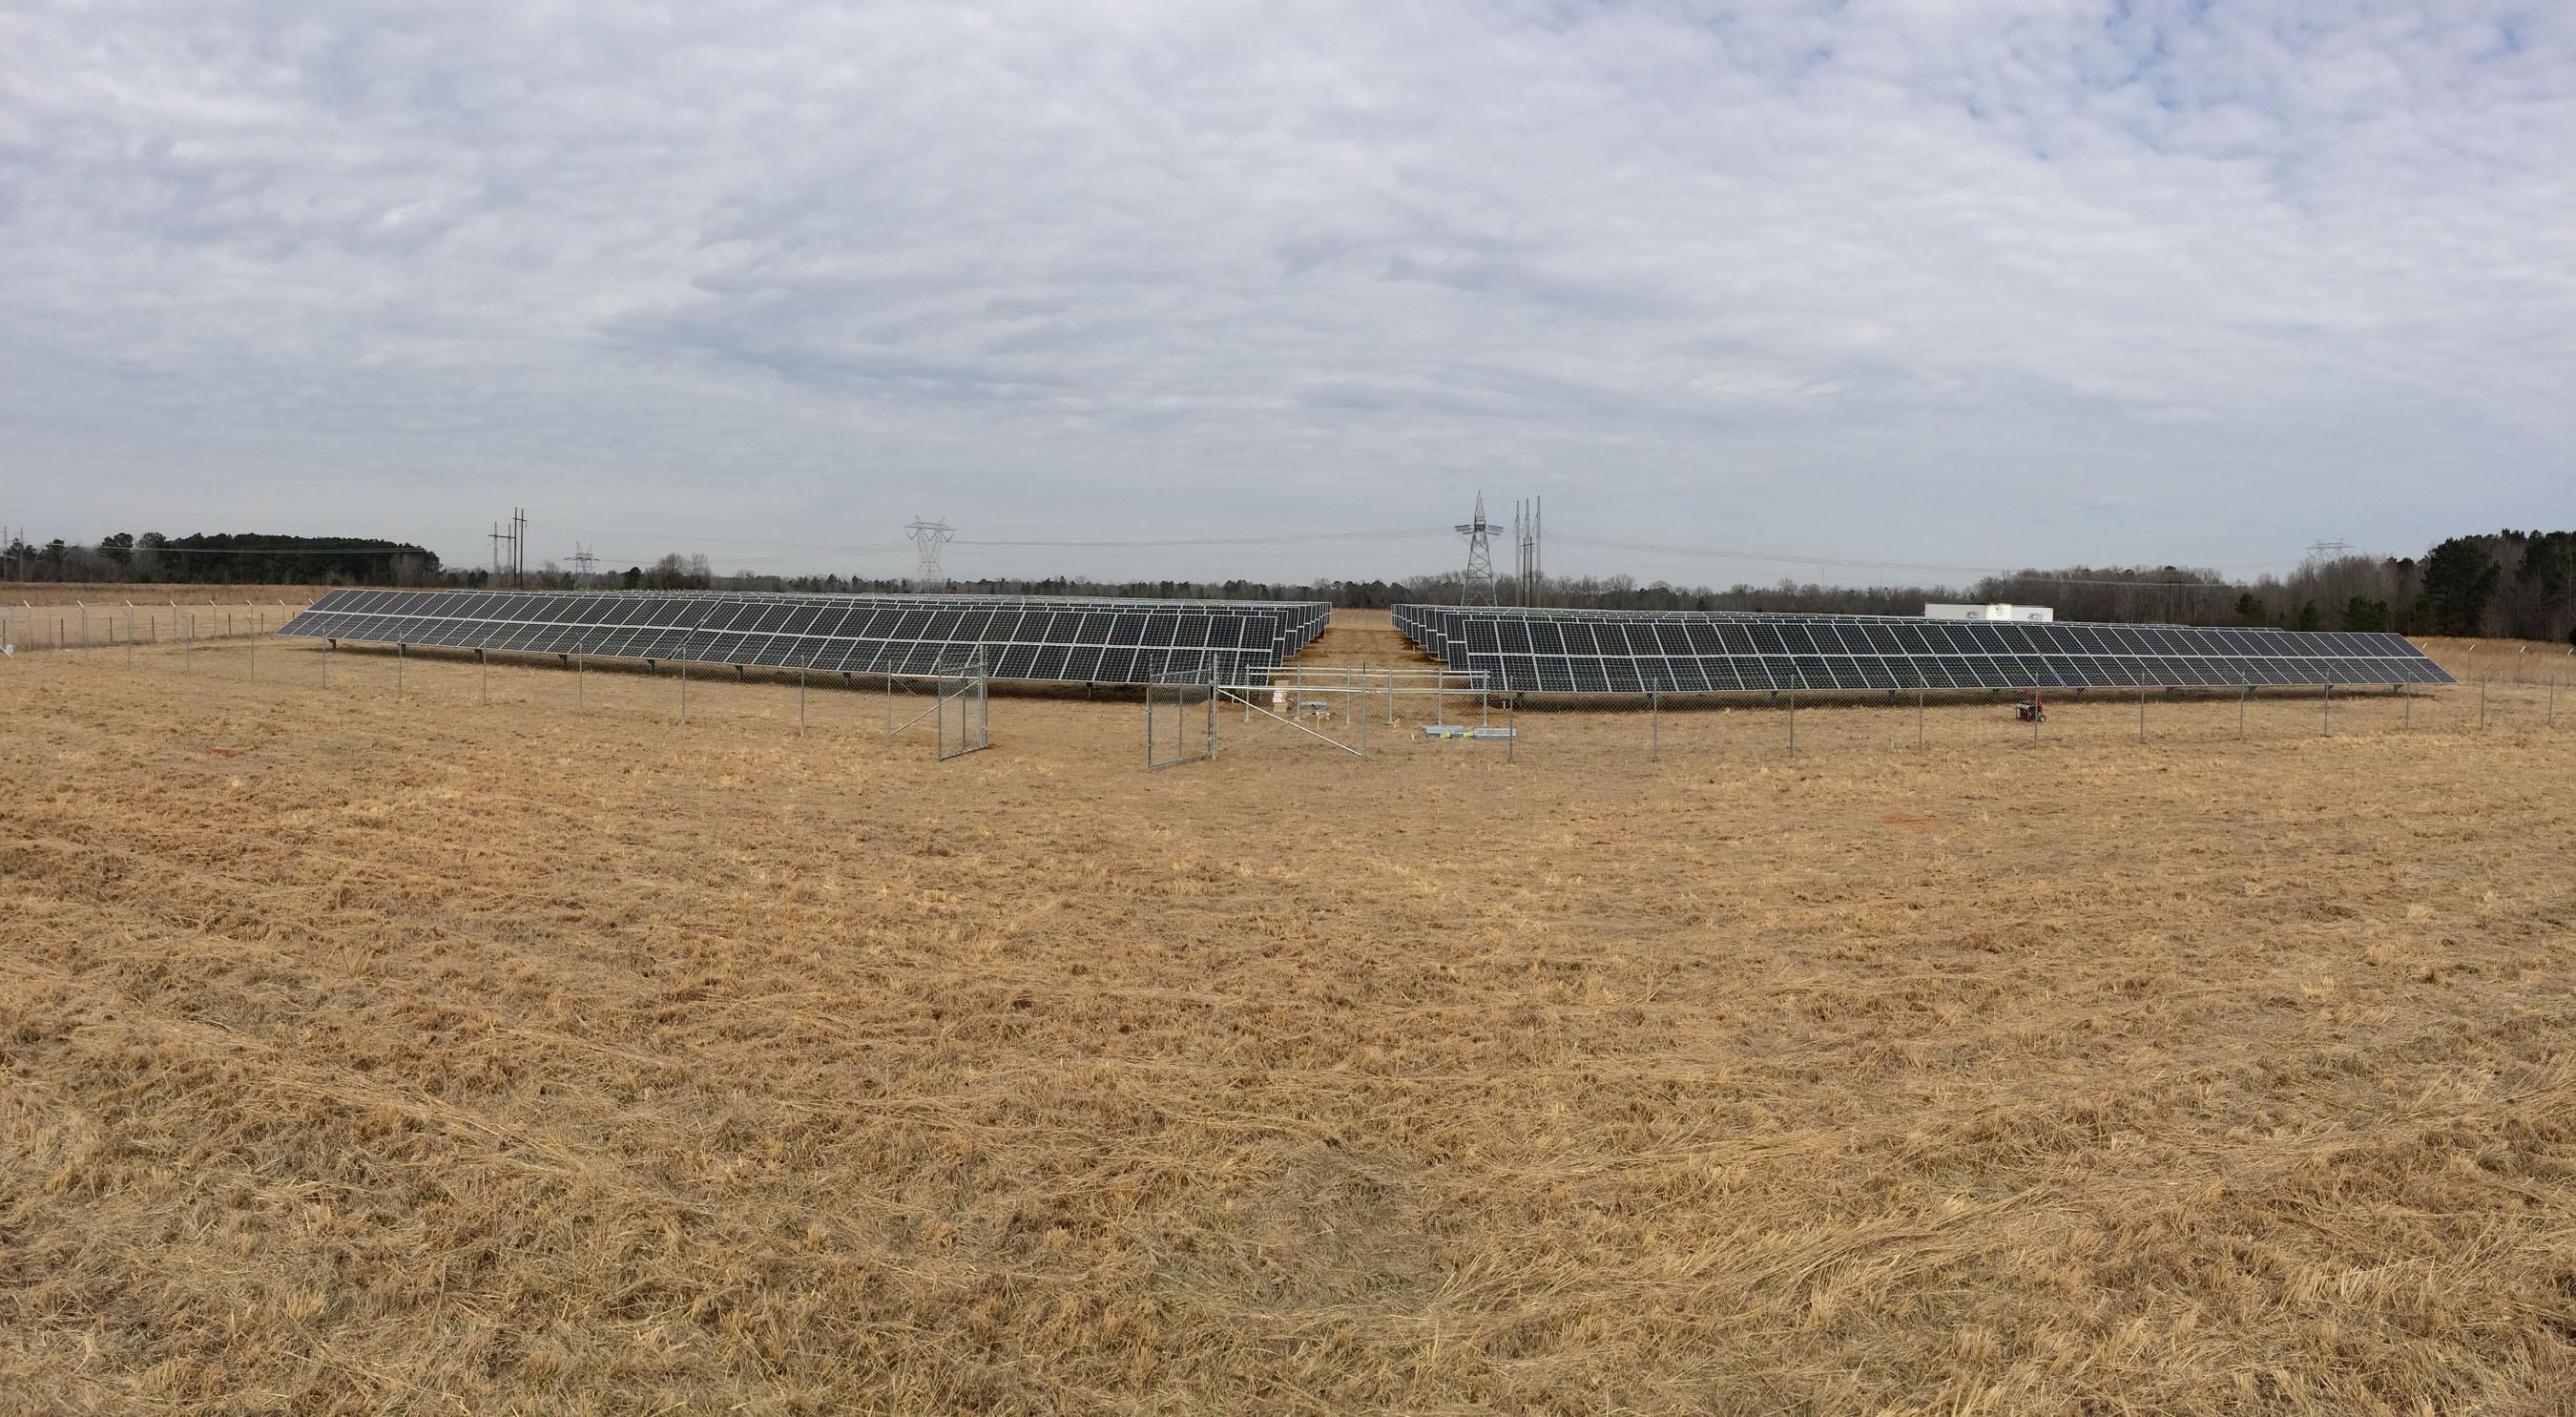 600 Kilowatt Solar Installation at historic Bethany Farms Bed and Breakfast. (PRNewsFoto/SunEdison, Inc., United Renewable Energy LLC) (PRNewsFoto/SUNEDISON, INC.)